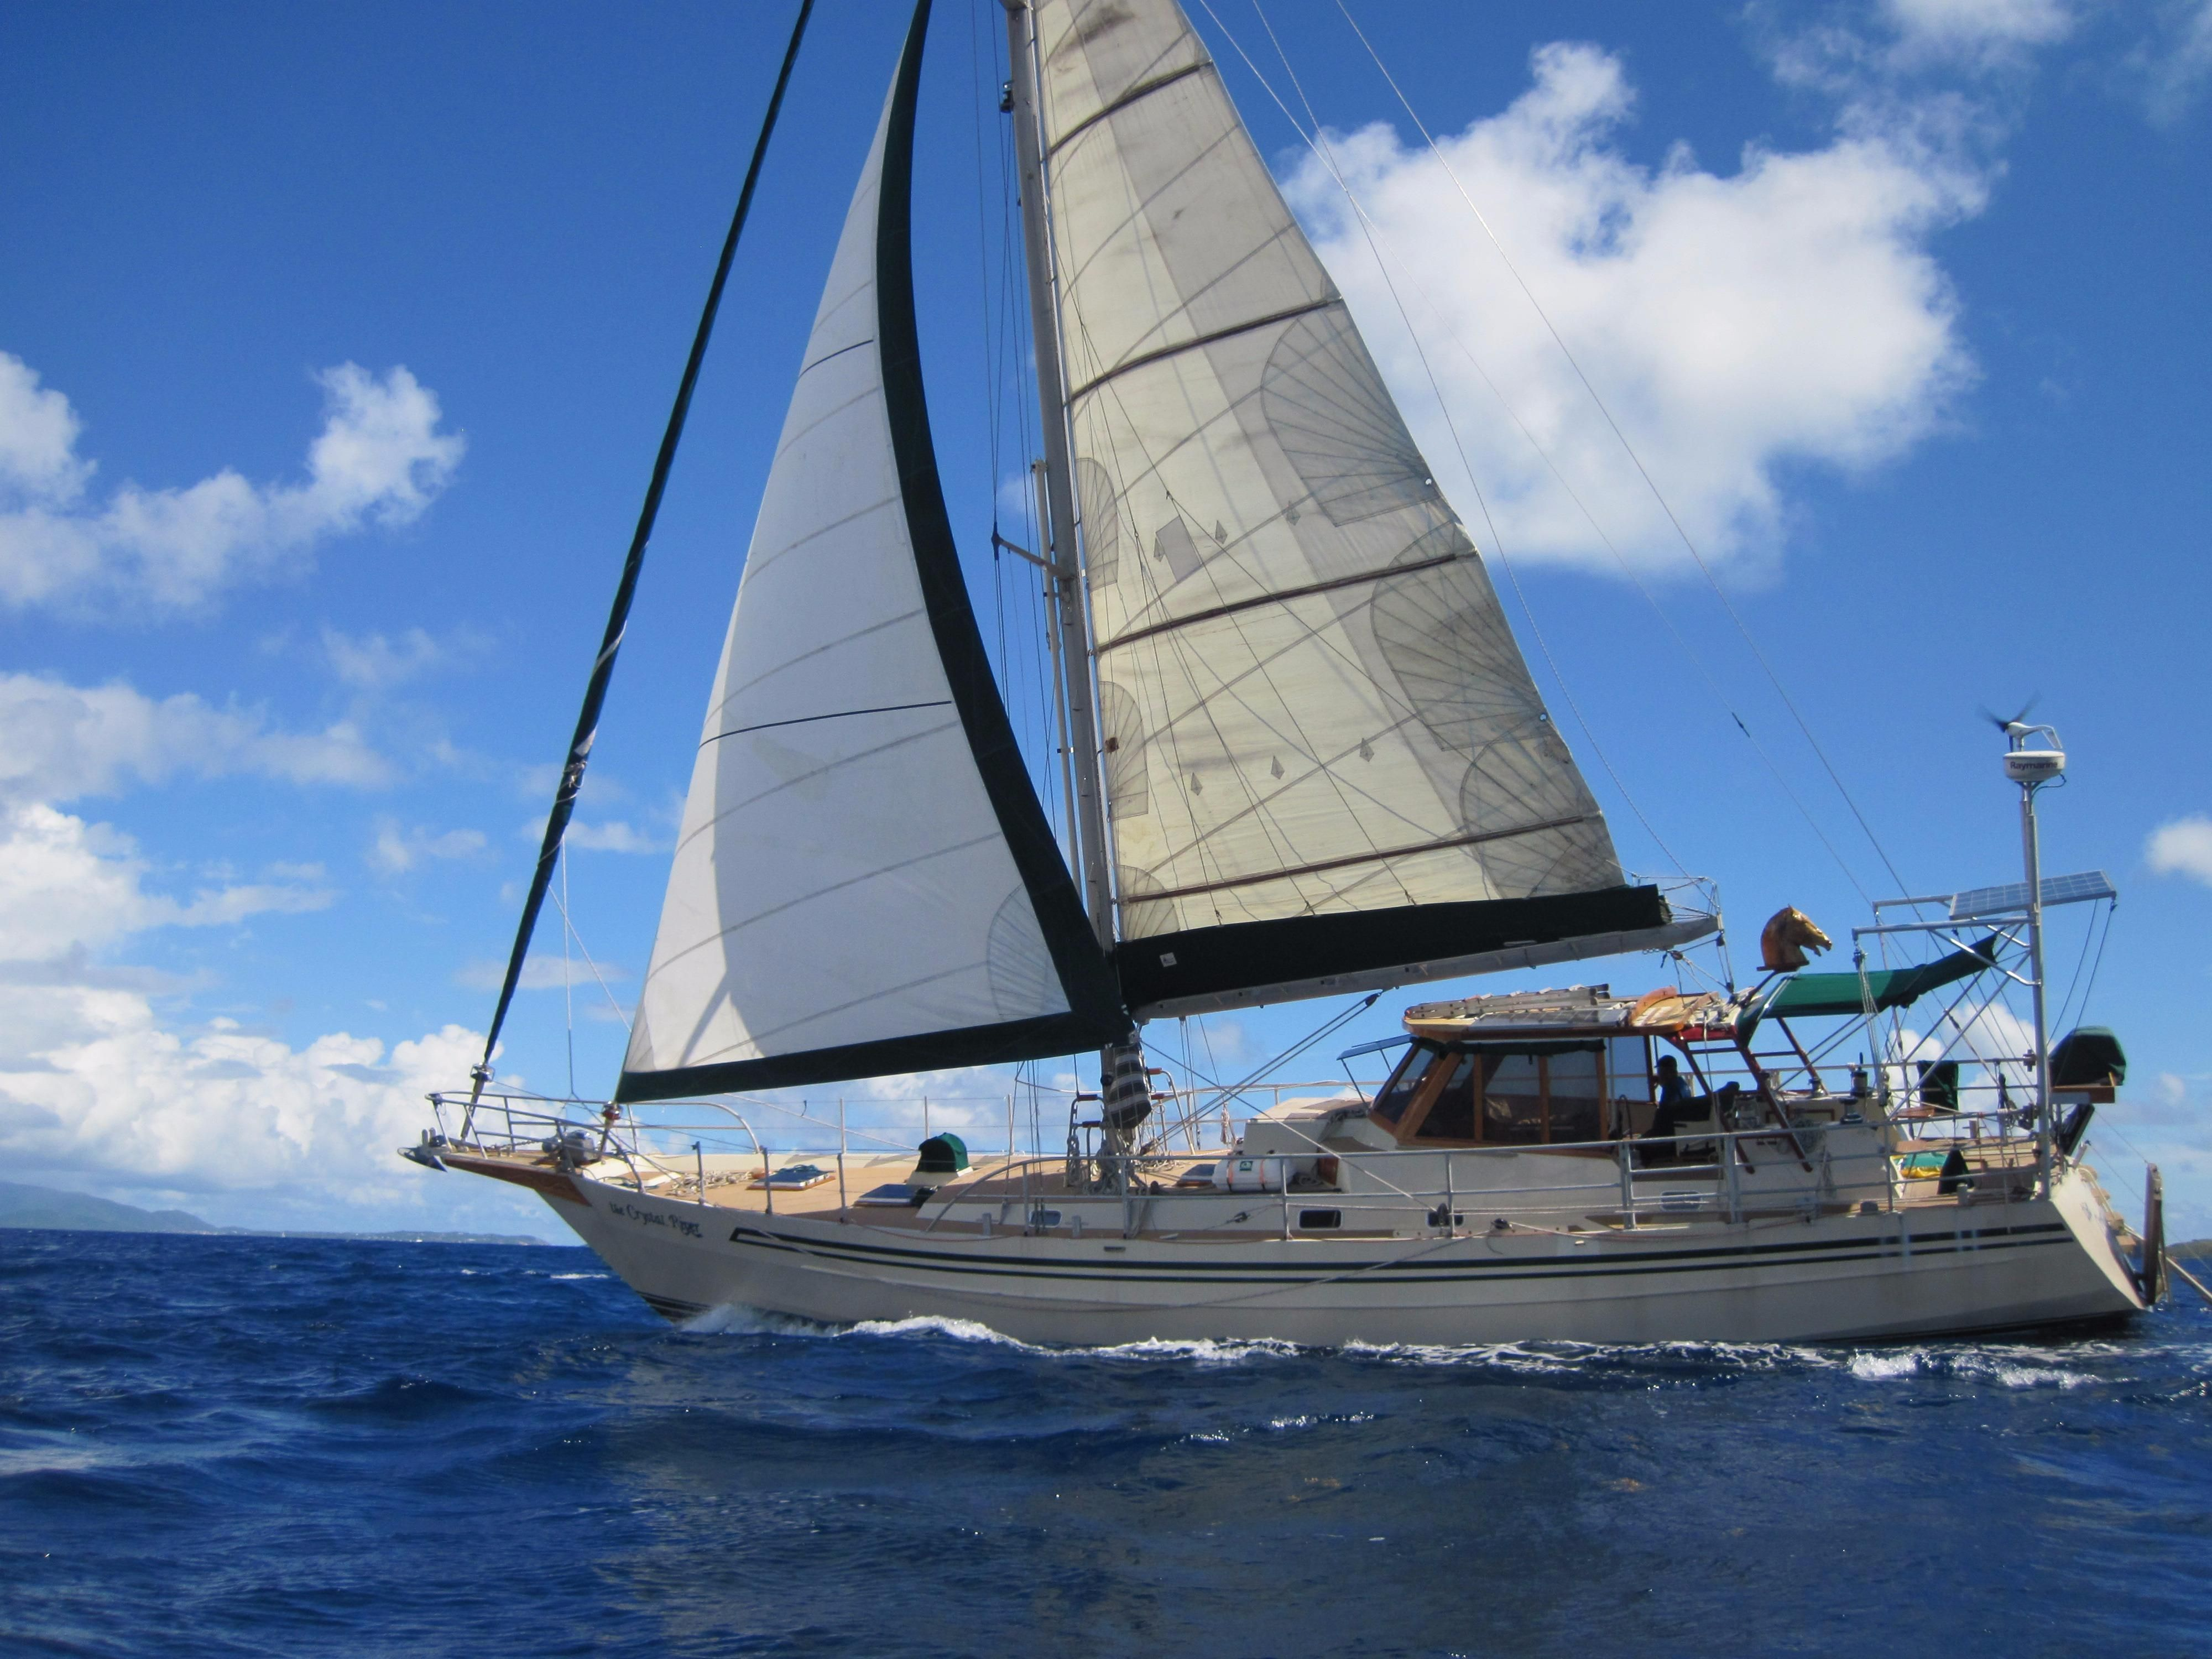 1984 Aluminum Boat Co Pilot House Segel Boot Zum Verkauf